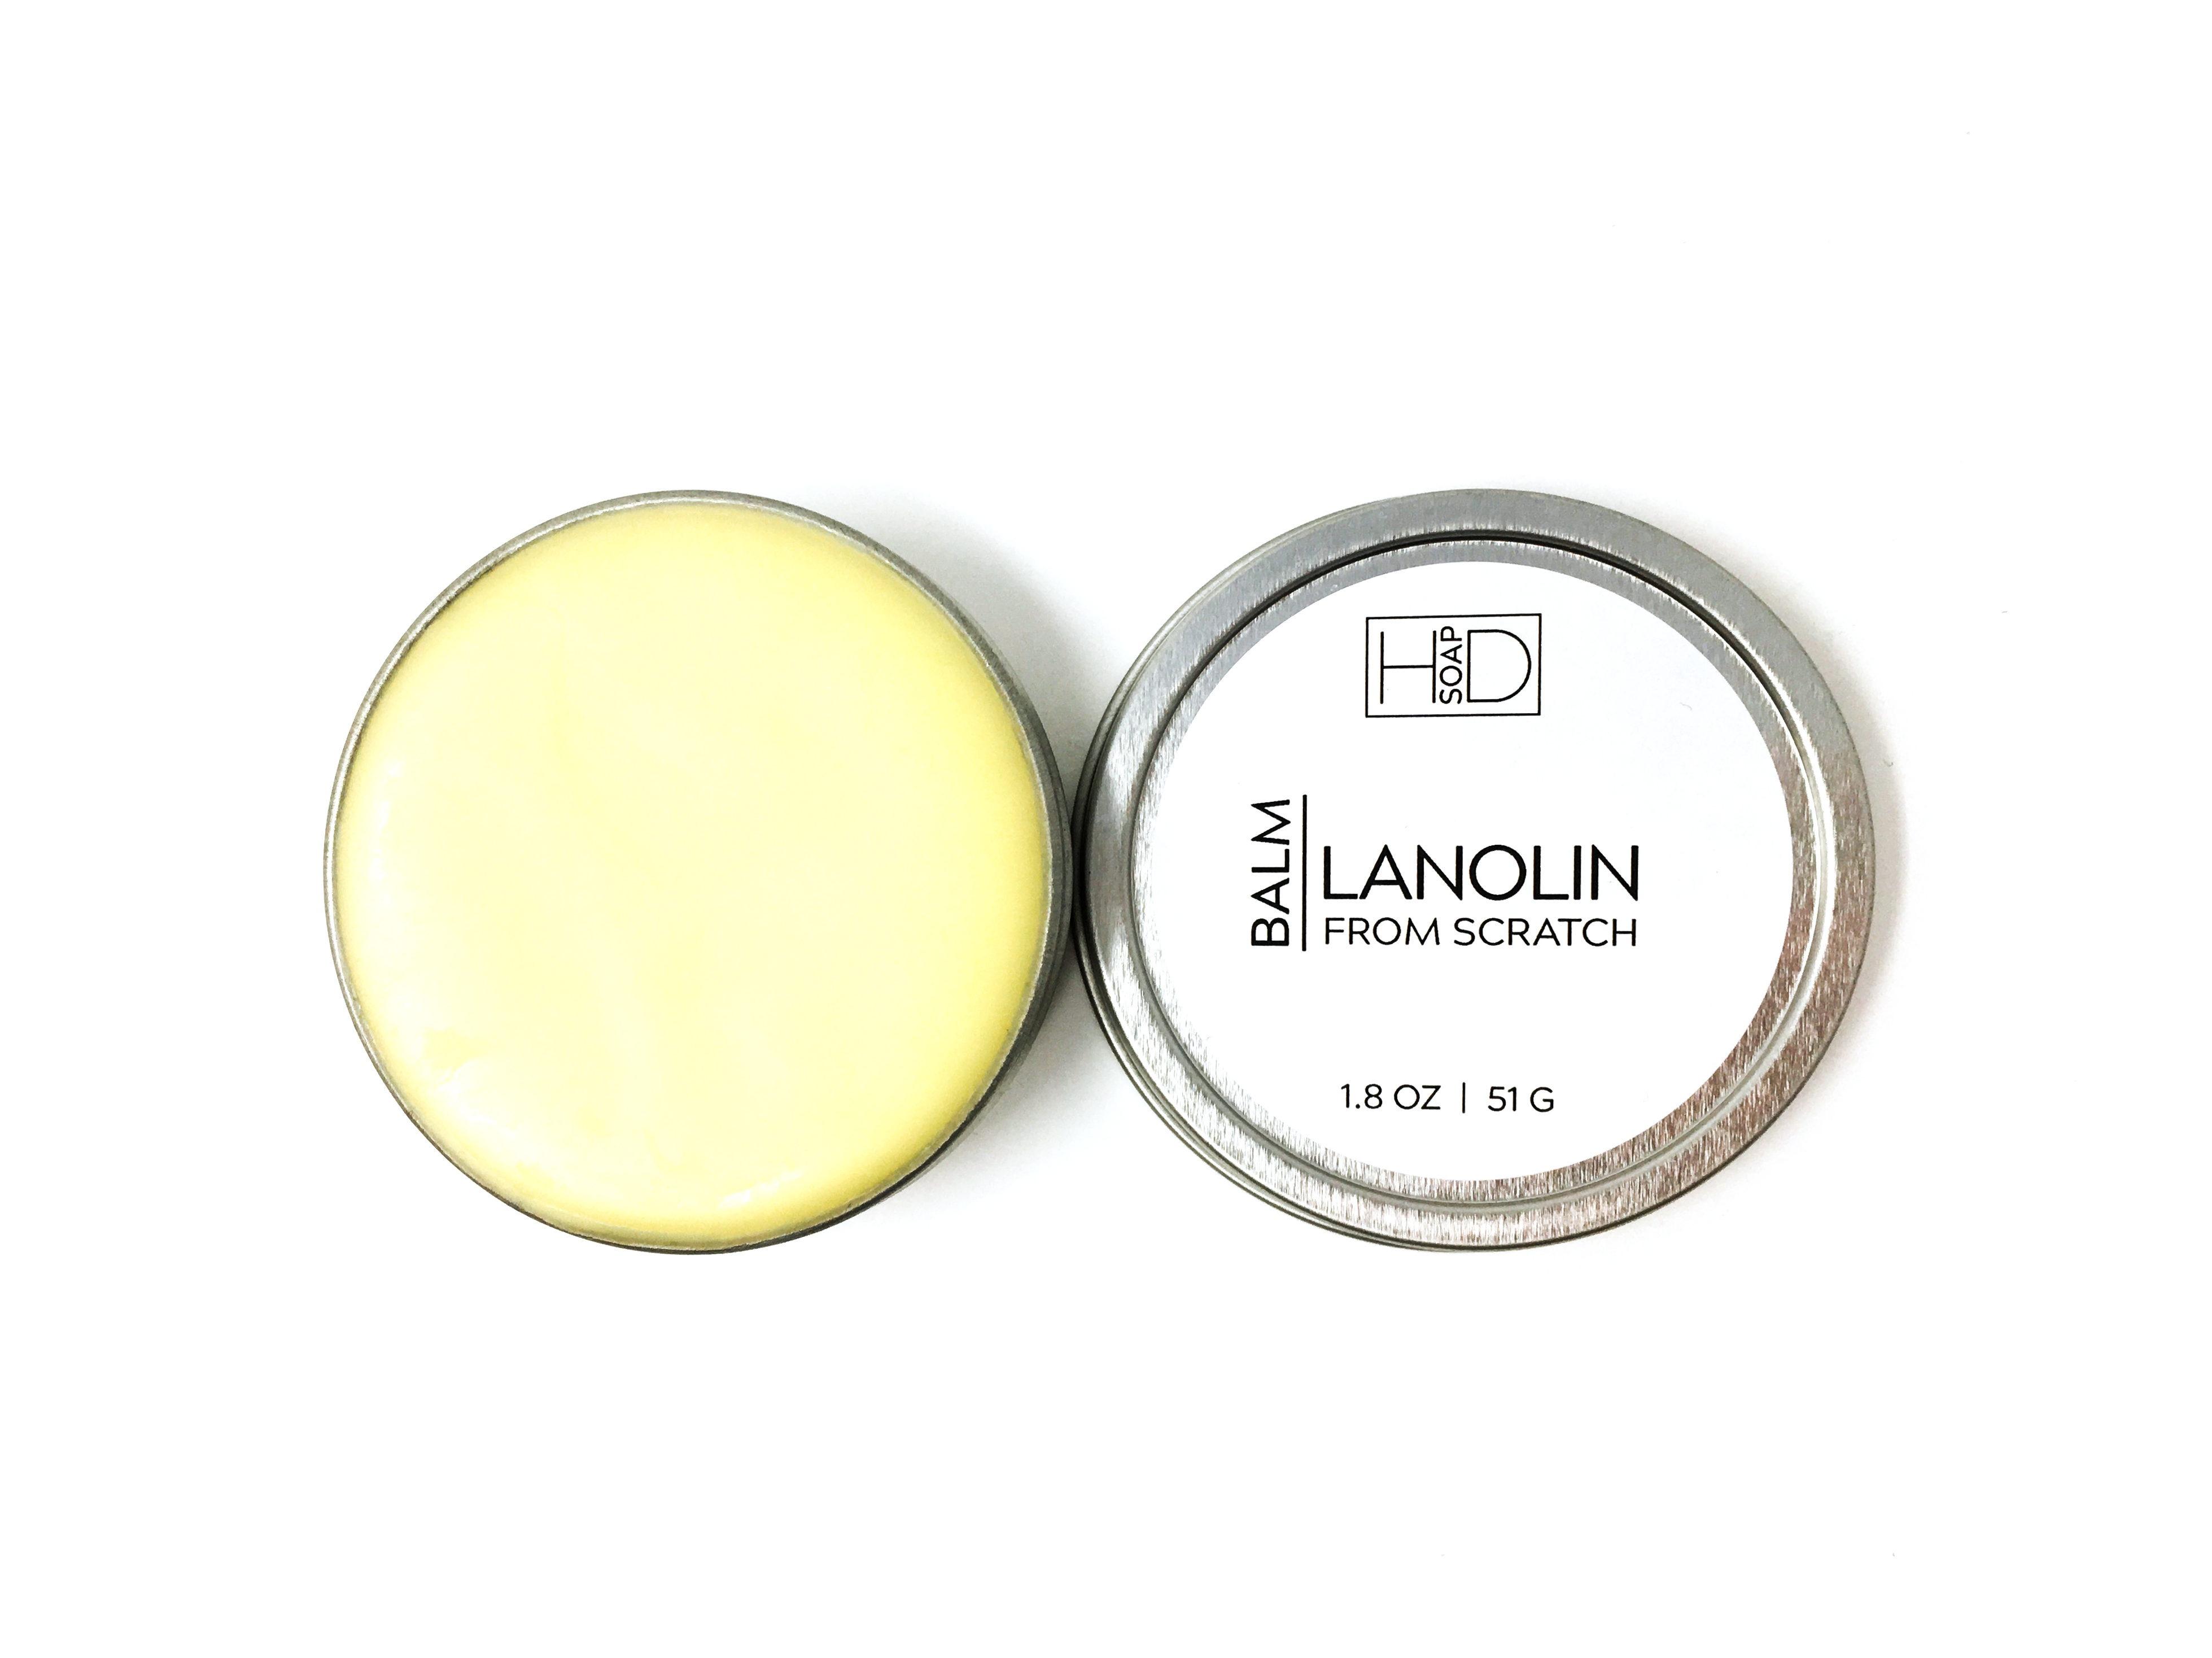 Lanolin Oil 2020 Global Sales Price Revenue Gross Margin And Market Share Forecast Report 2026